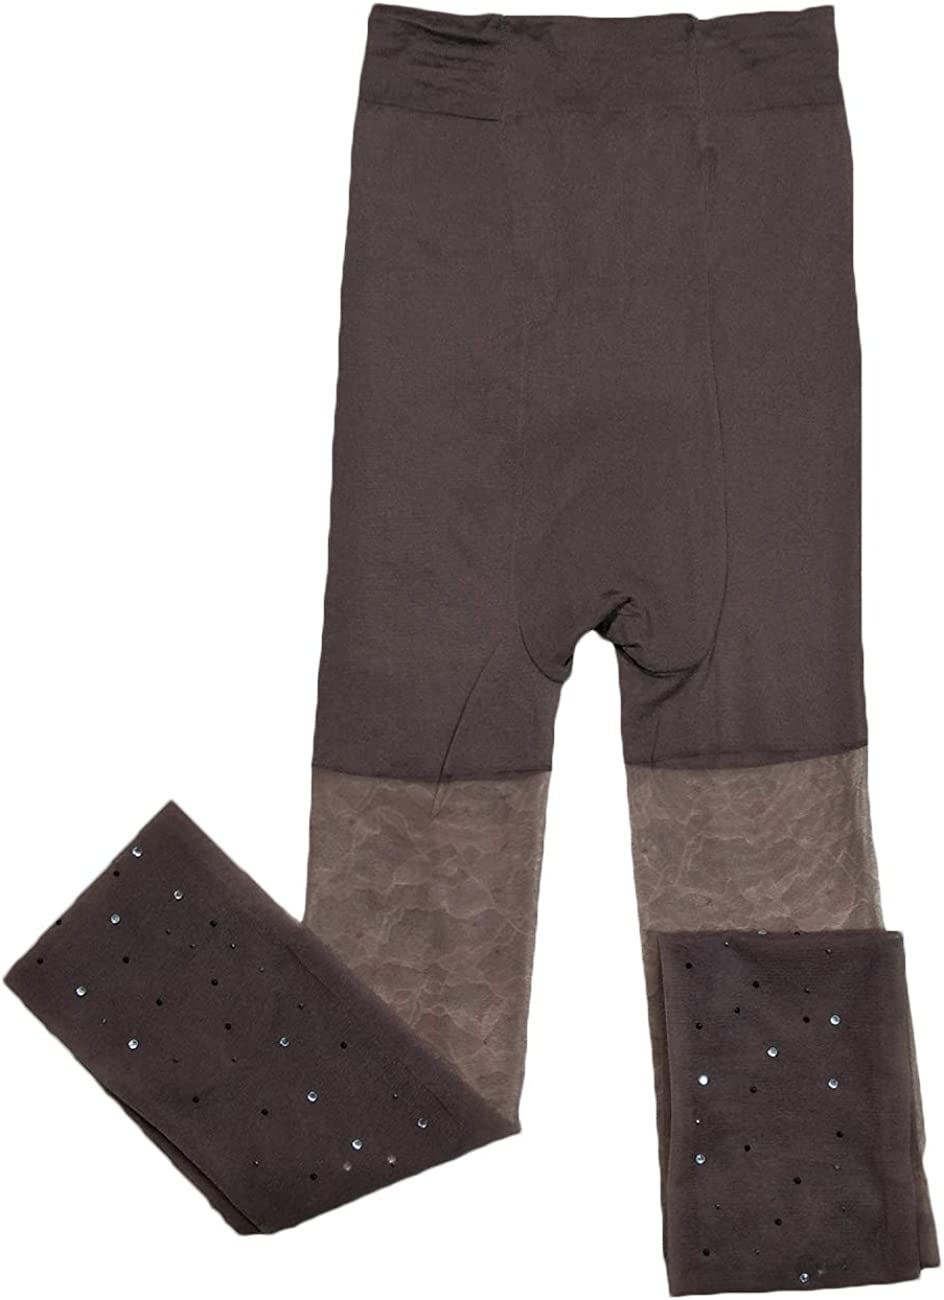 Women's 2 Pack Diamond Patch Long Lace Socks Hosiery Tights Sexy Sheer Nightwear High Stockings Pantyhose